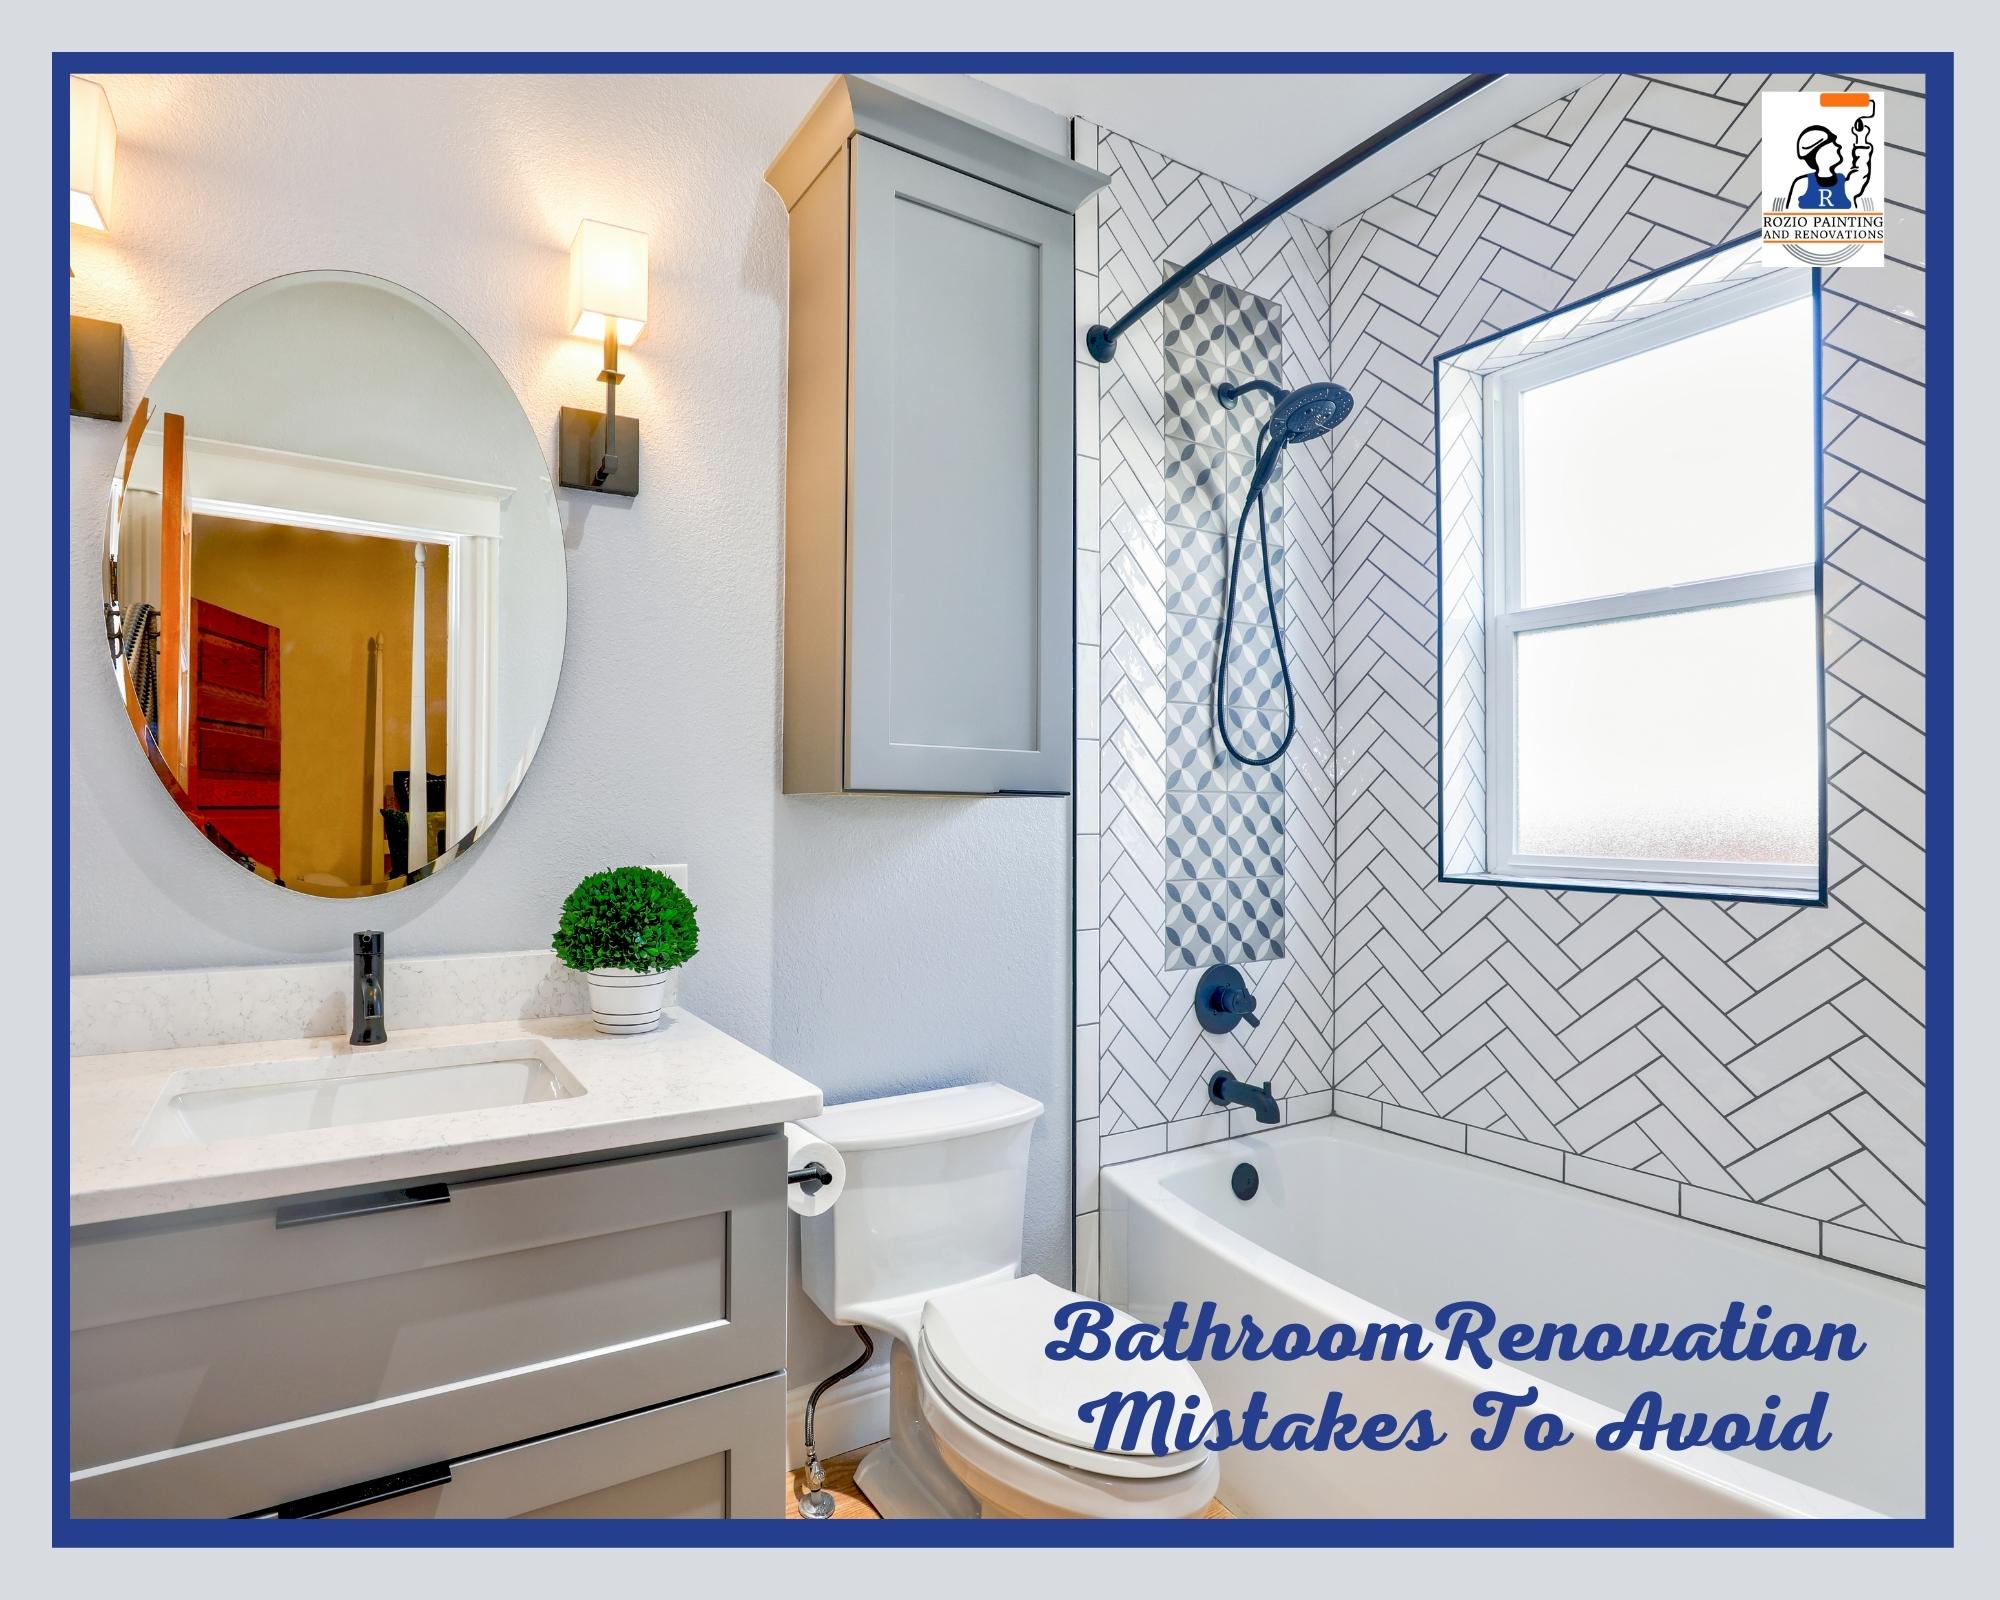 6 Bathroom Renovation Mistakes to Avoid